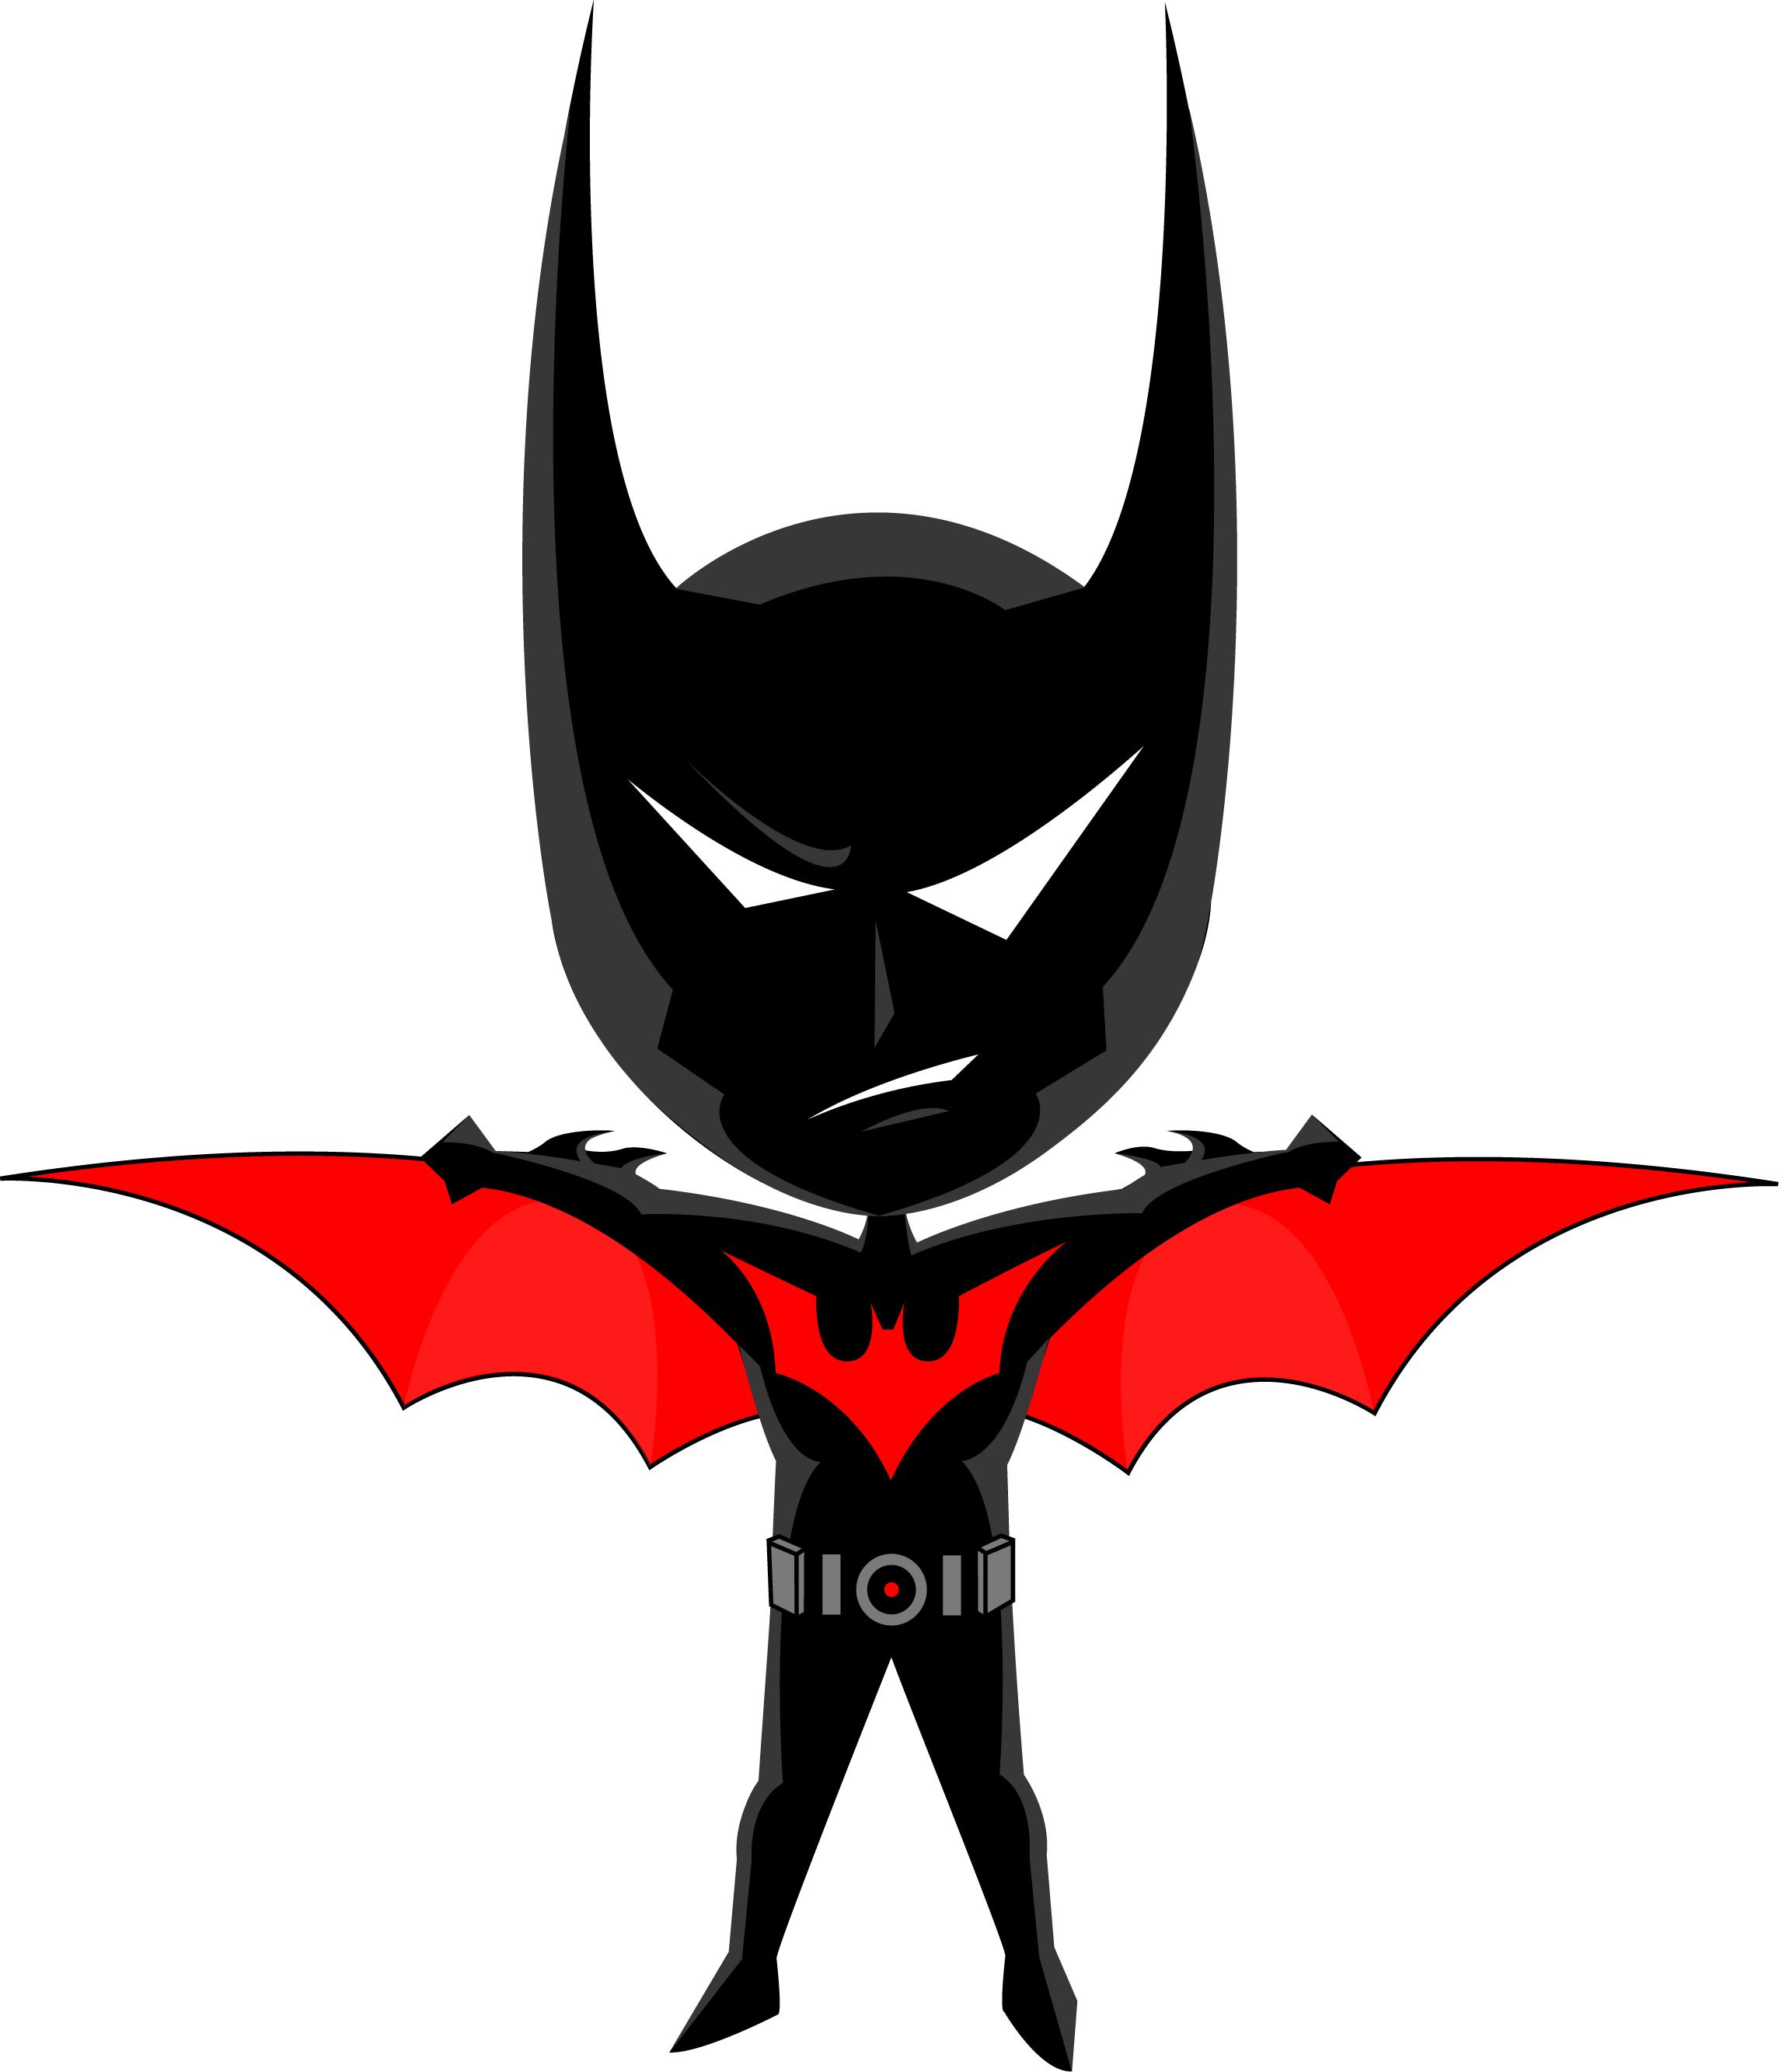 Chibi Batman Beyond By Masterrabbit On Deviantart Batman Beyond Batman Chibi